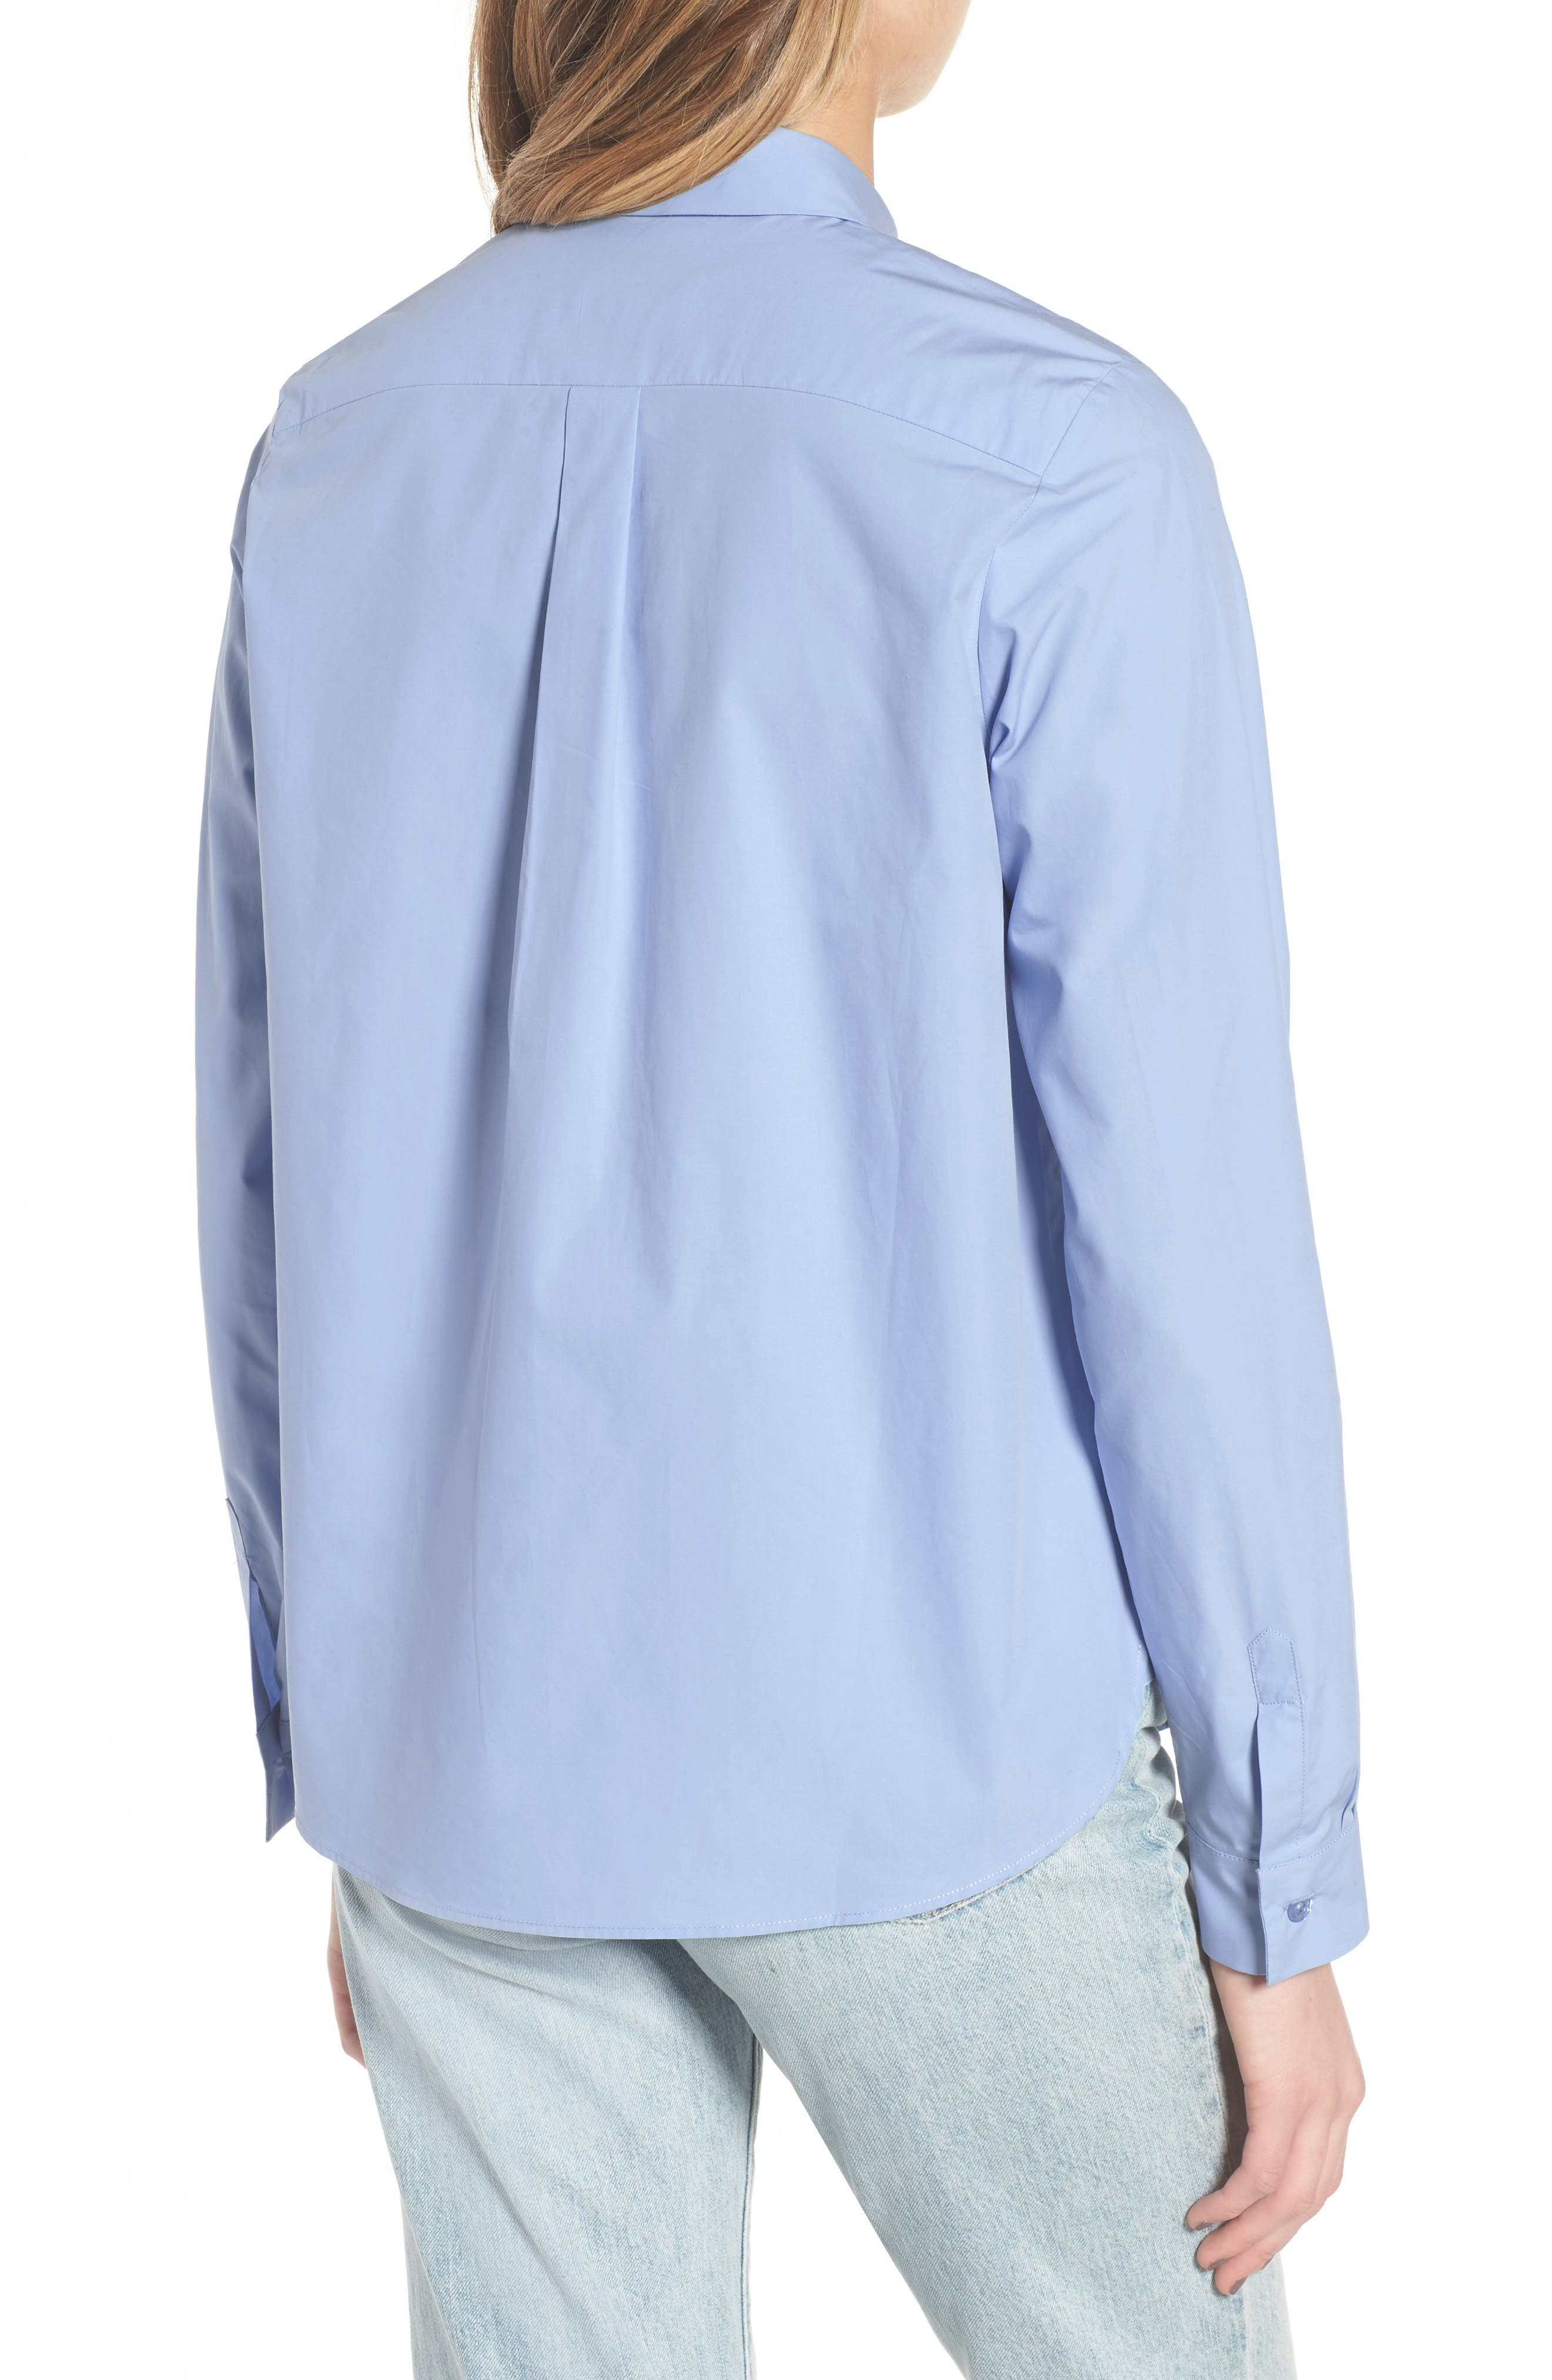 Leonide Shirt,                             Alternate thumbnail 2, color,                             400